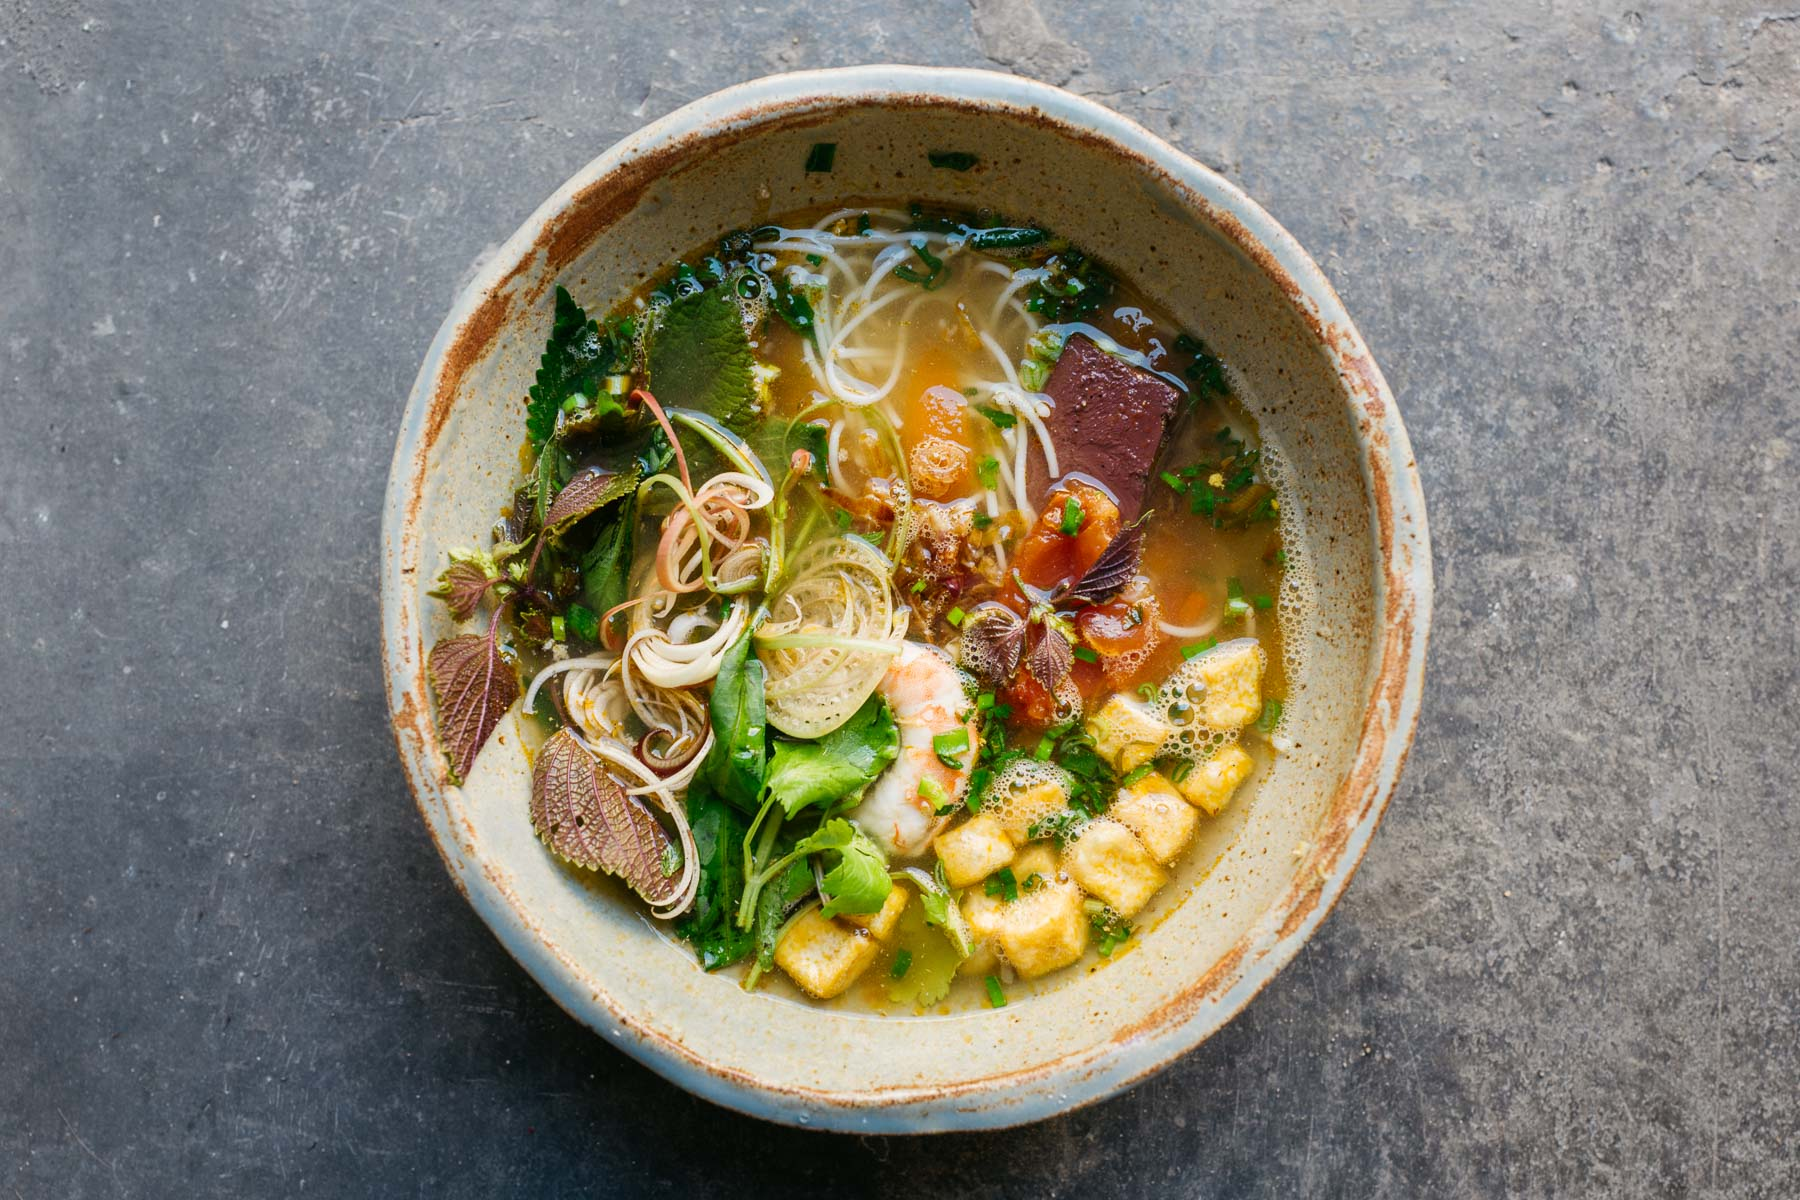 zupa krabow (bún riêu cua)